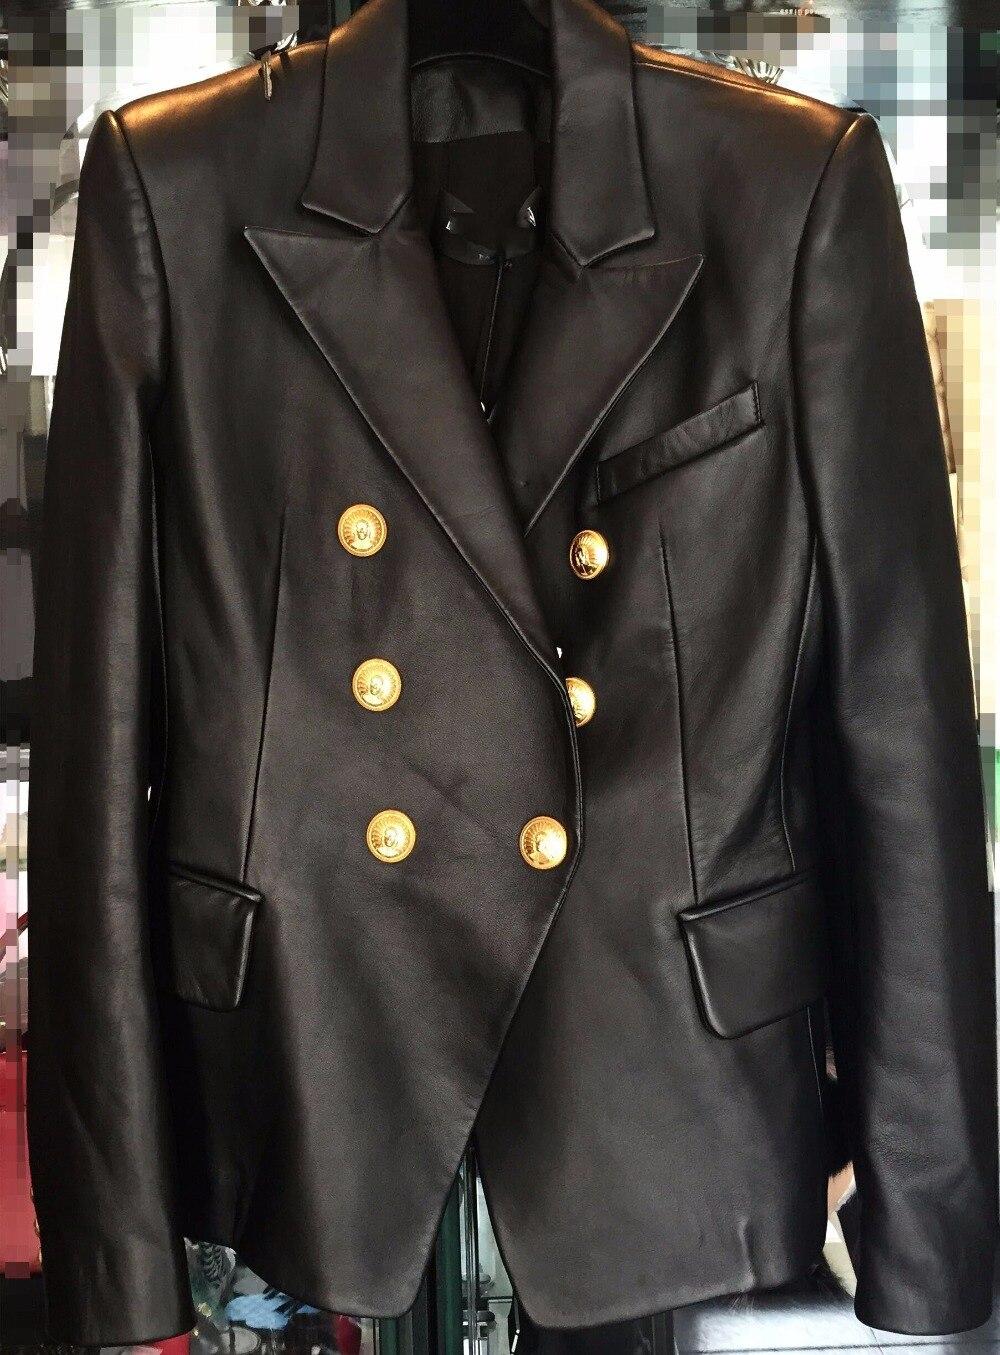 Jacket Blazer Runway Slim Gold Black Double-Breasted Women Fashion Luxury Buckles Sheepskin